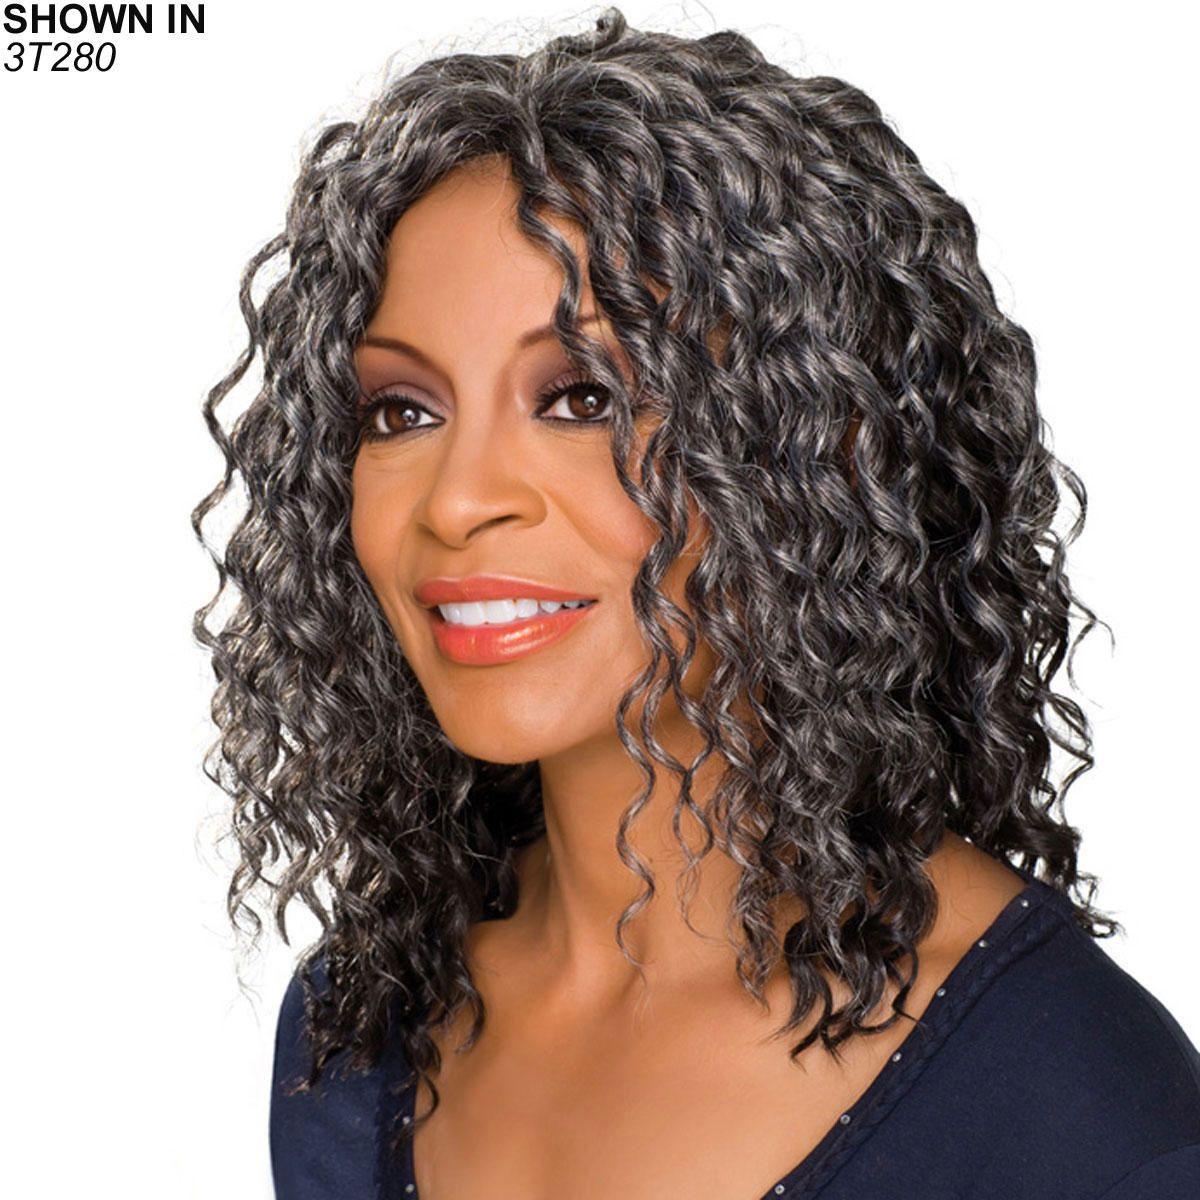 Glenda Wig By Foxy Silver 174 Wig Com